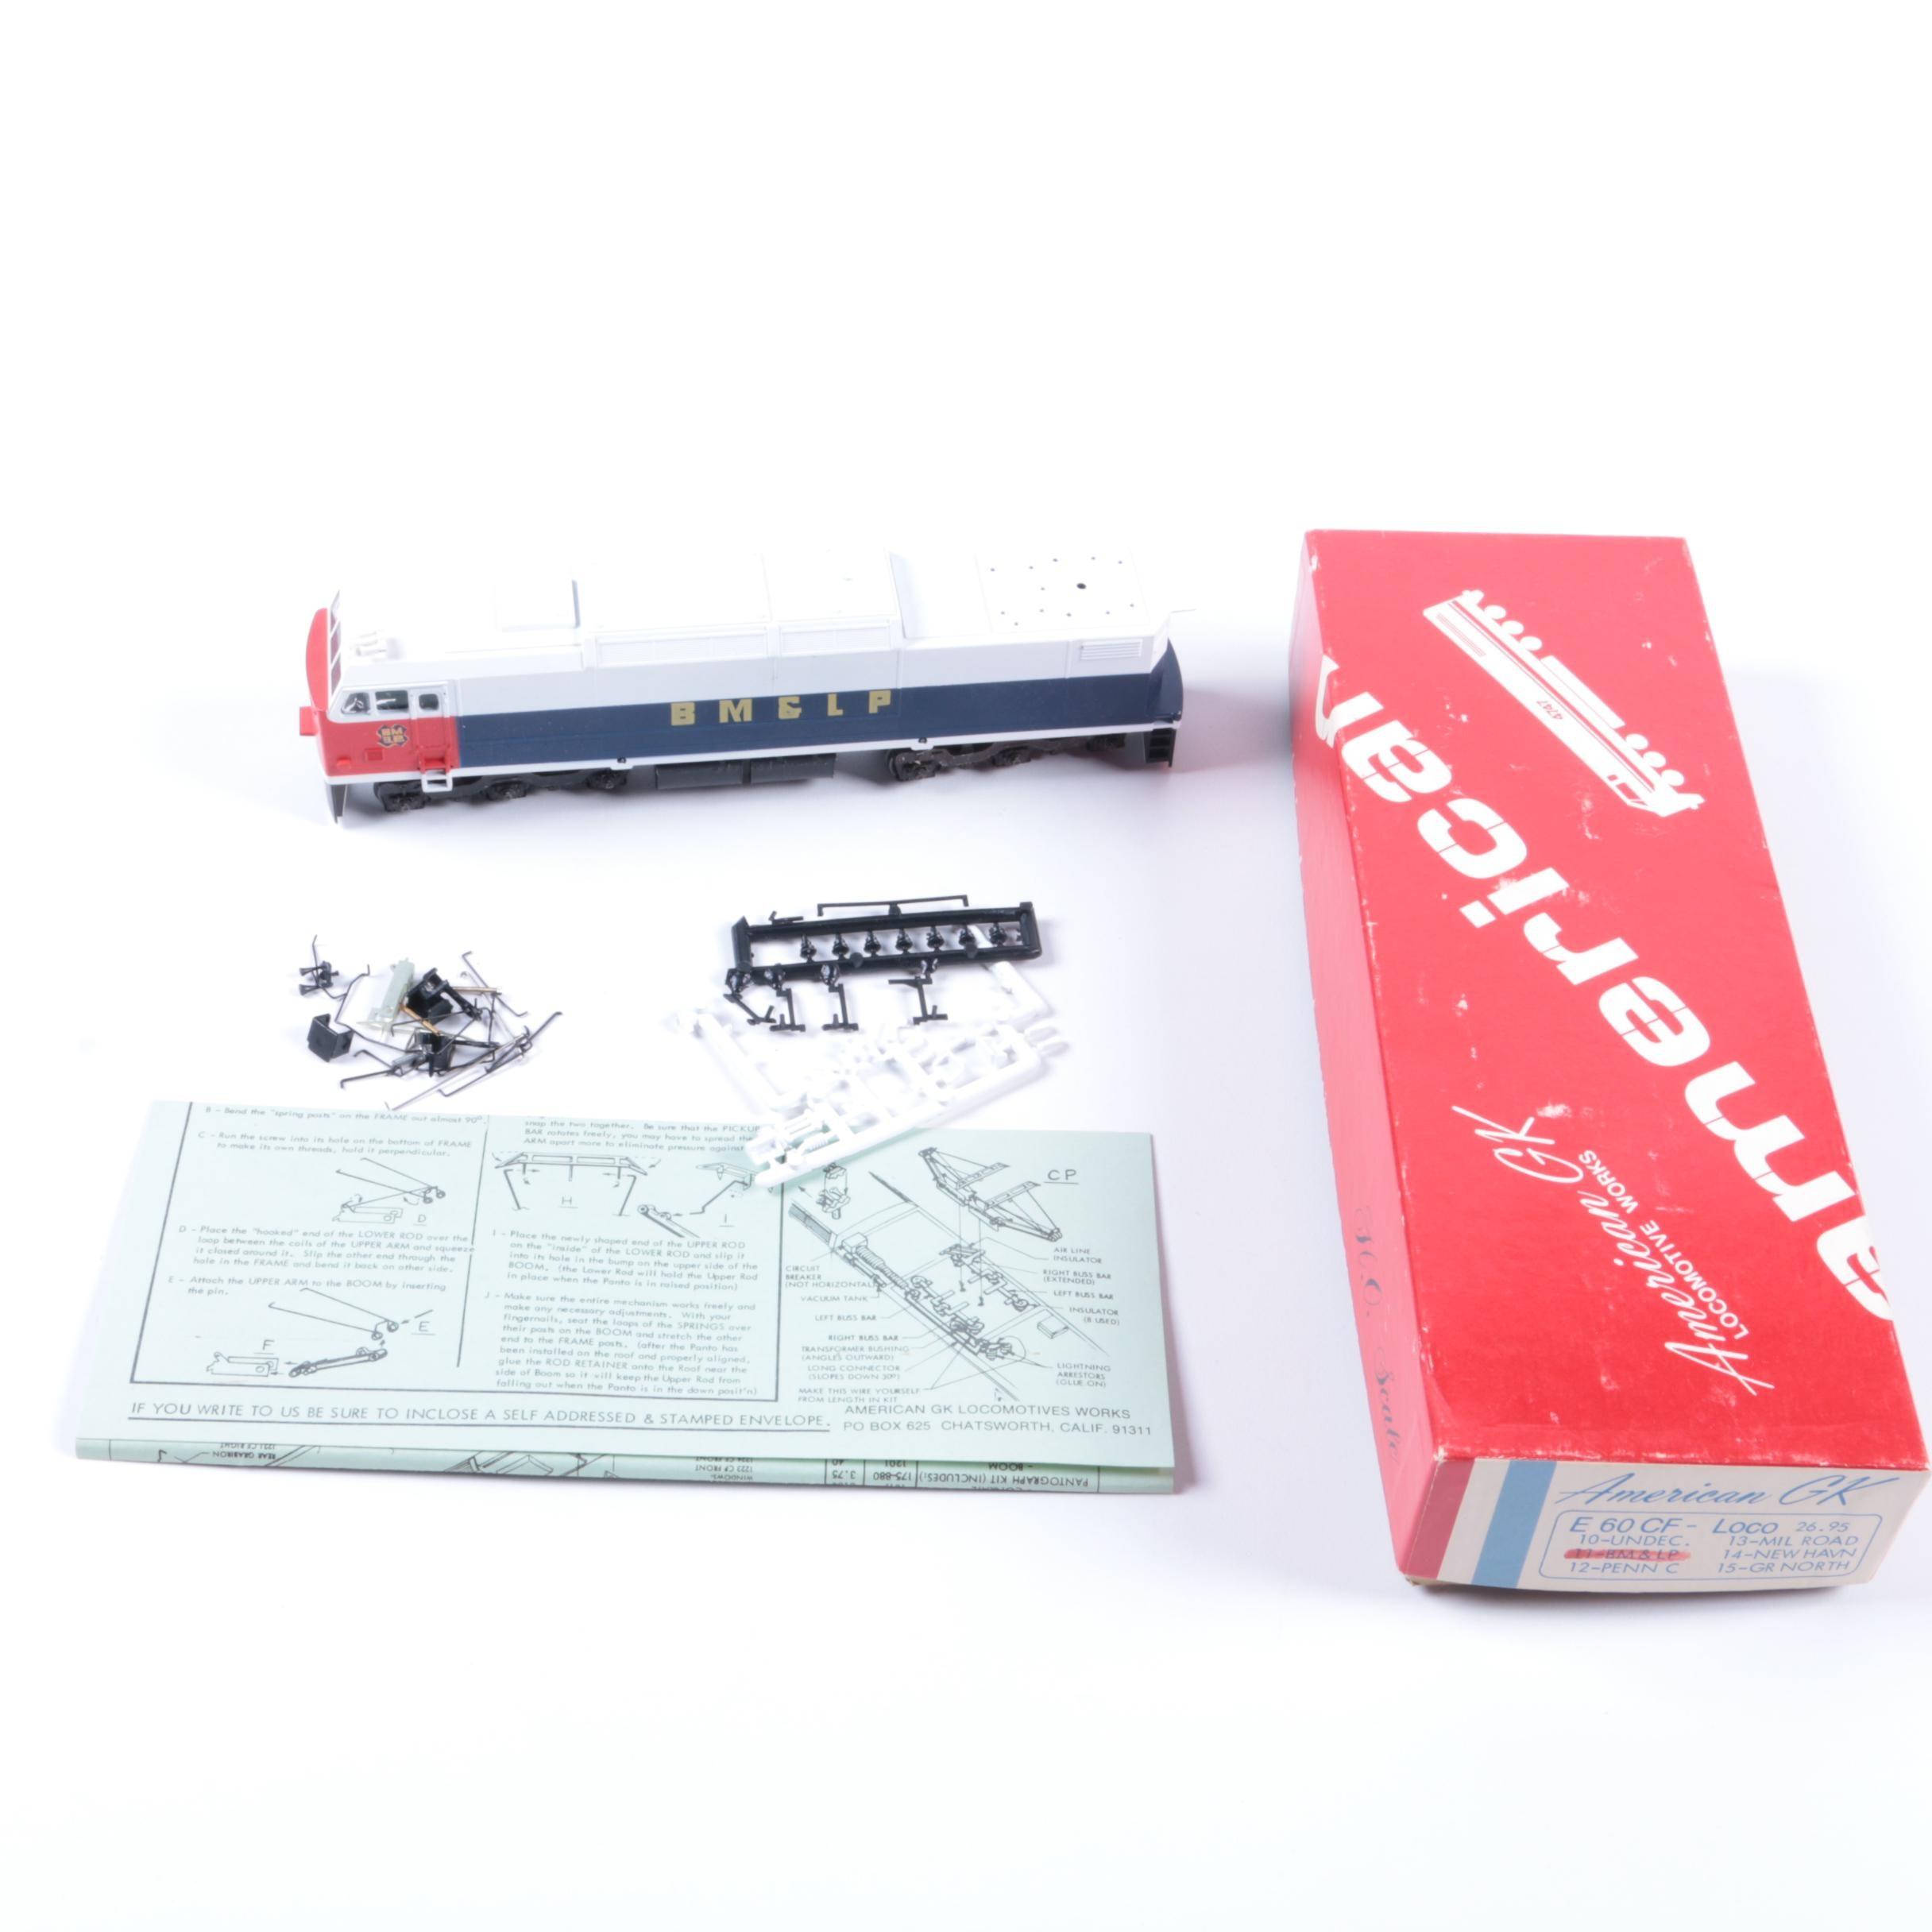 BM&LP Engine Model Kit by American GK